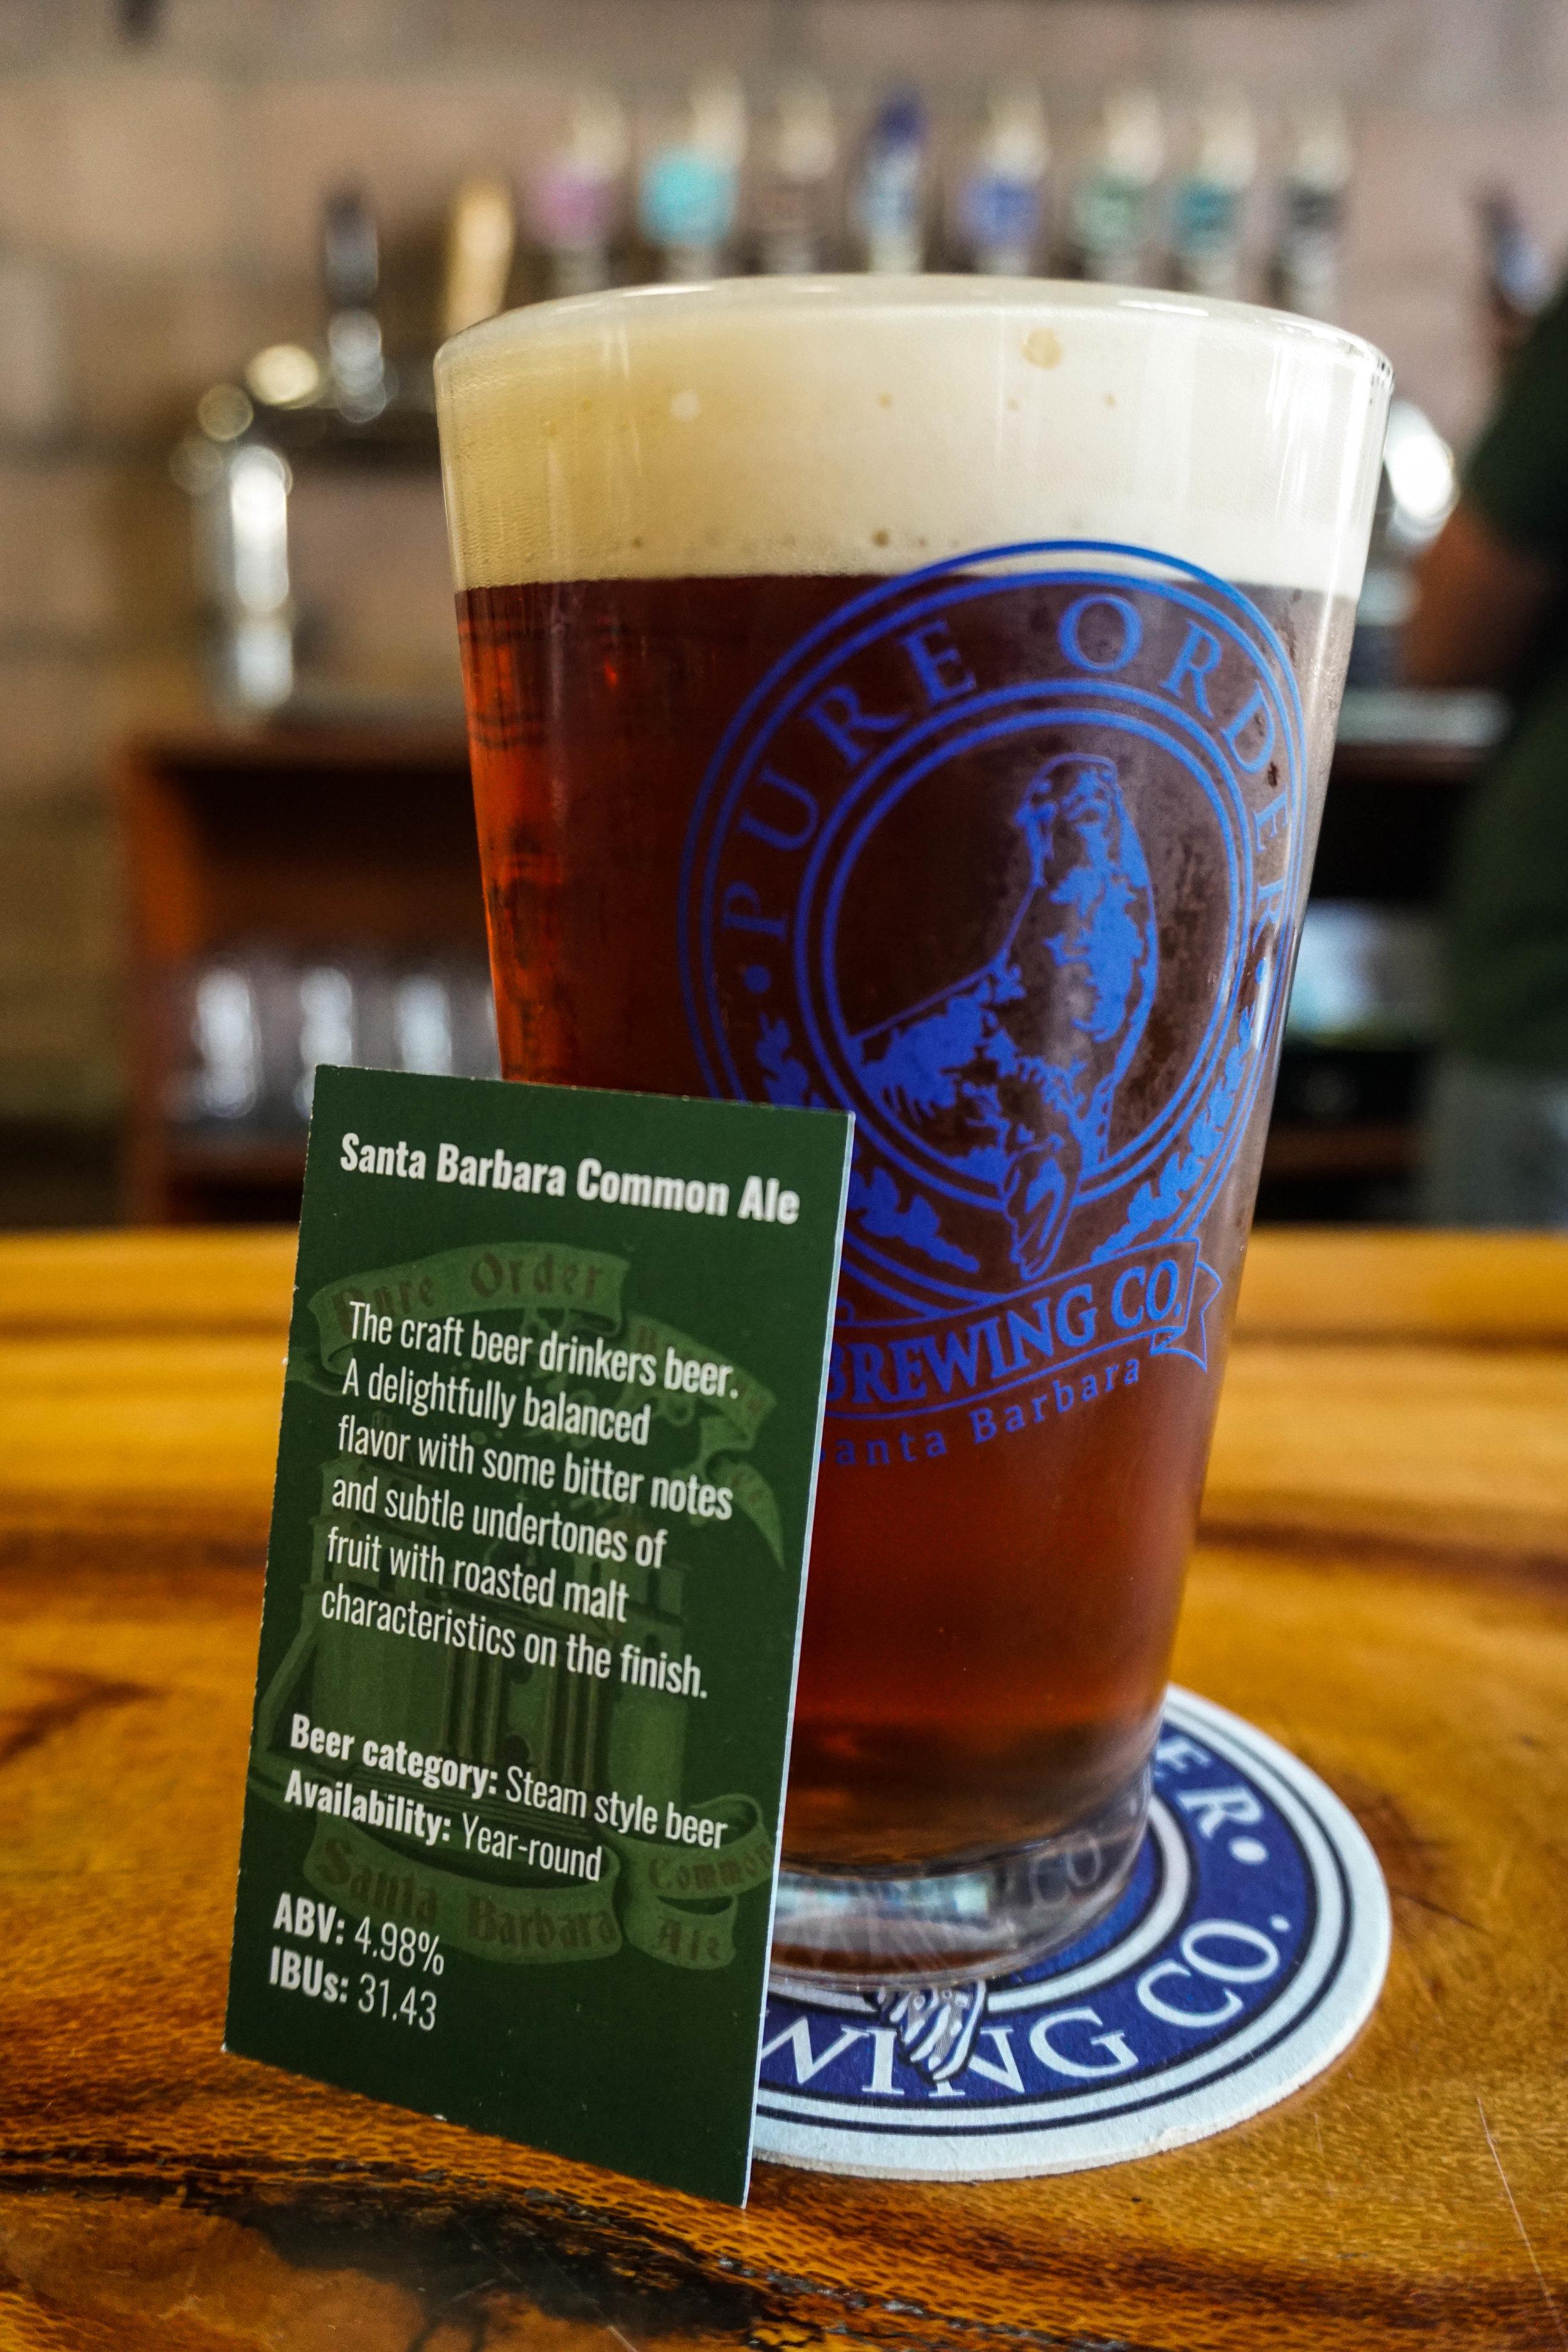 Santa Barbara Common Ale